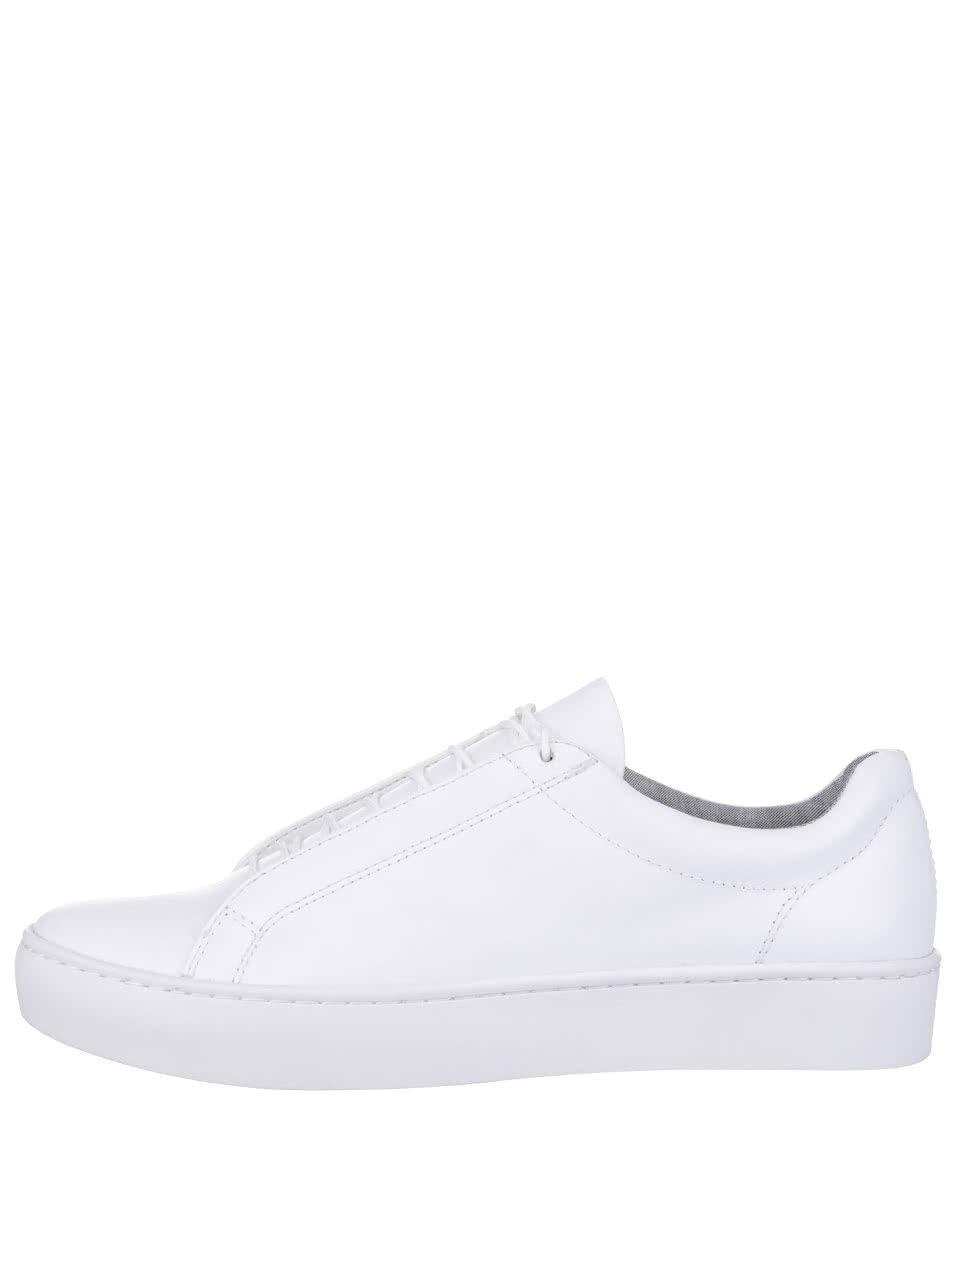 Bílé dámské kožené tenisky na platformě Vagabond Zoe